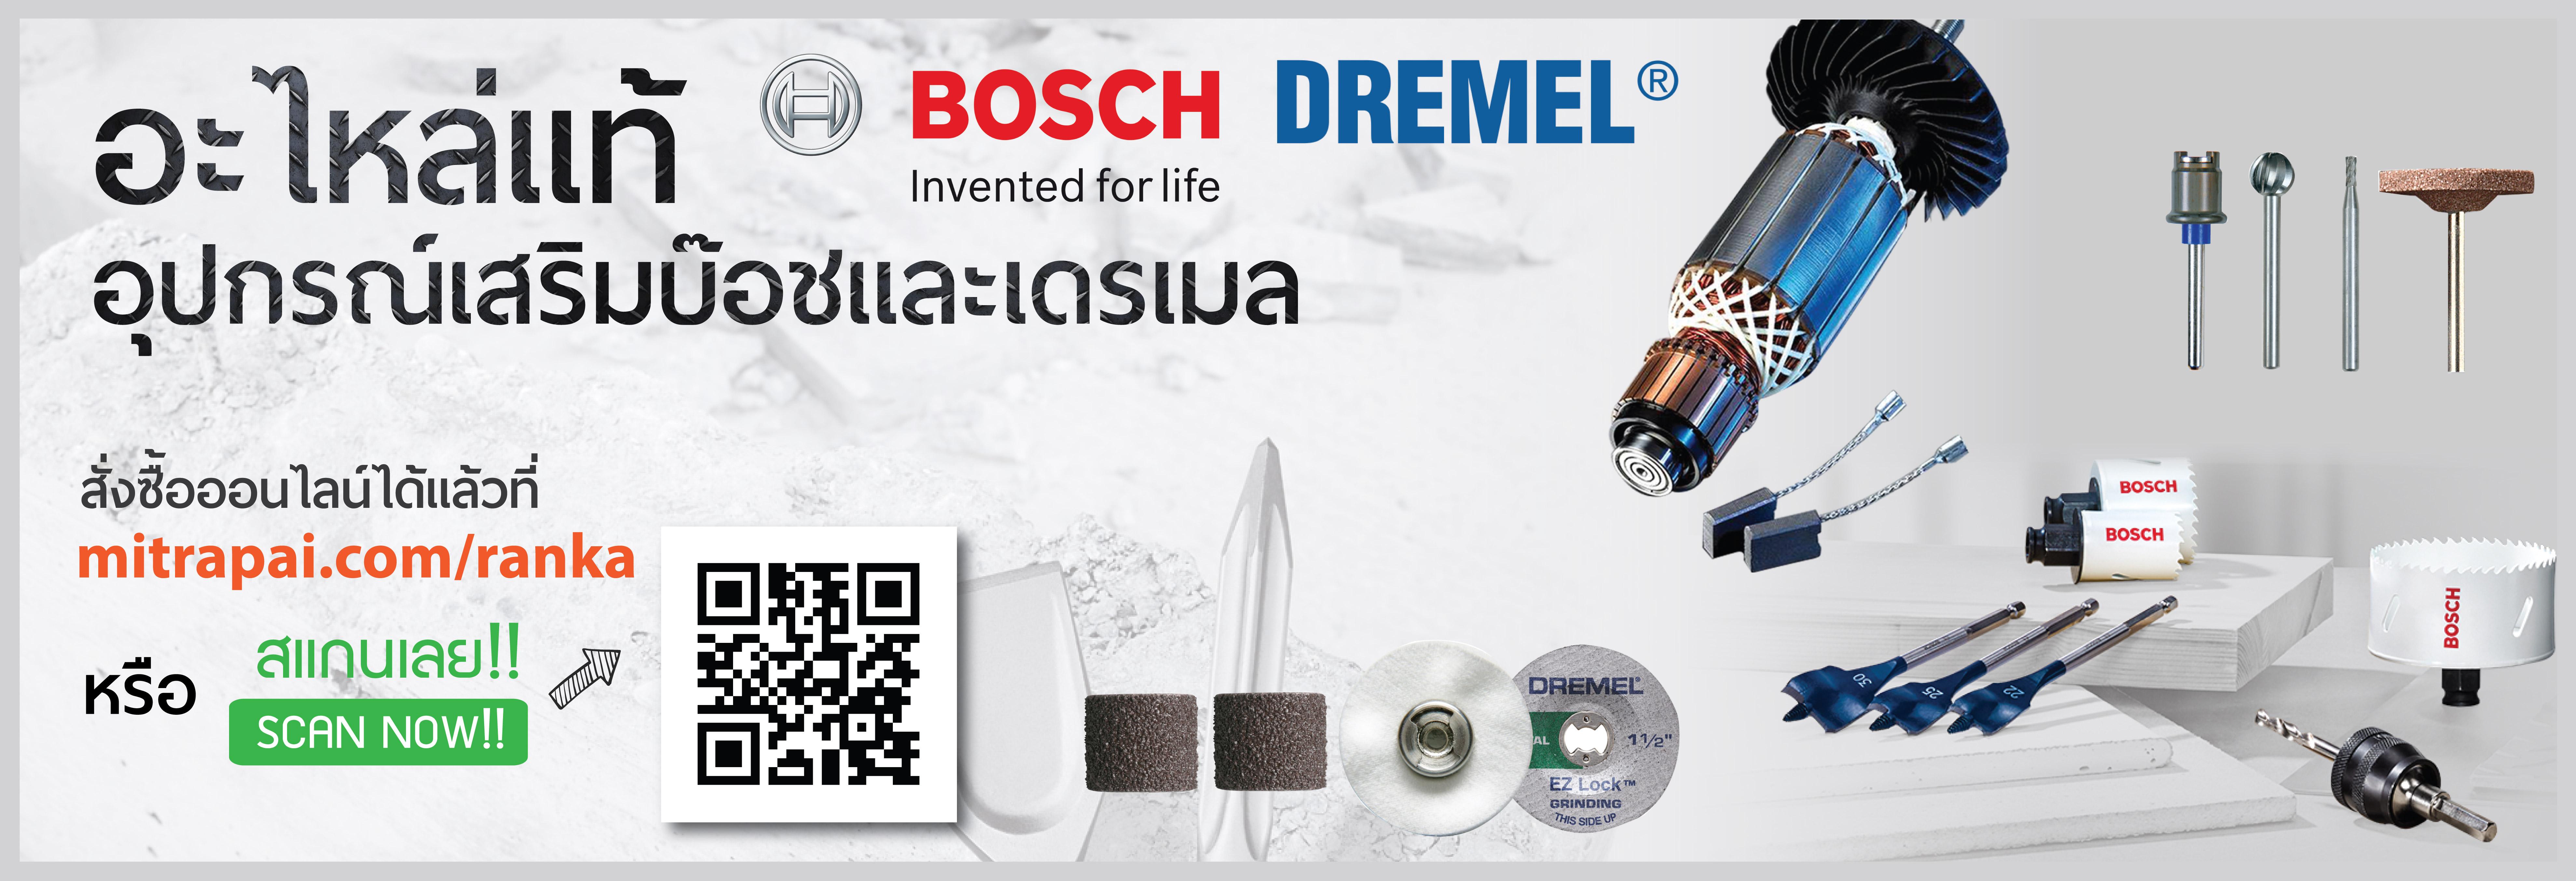 Dremel Accessories/ อุปกรณ์เสริมเดรเมล